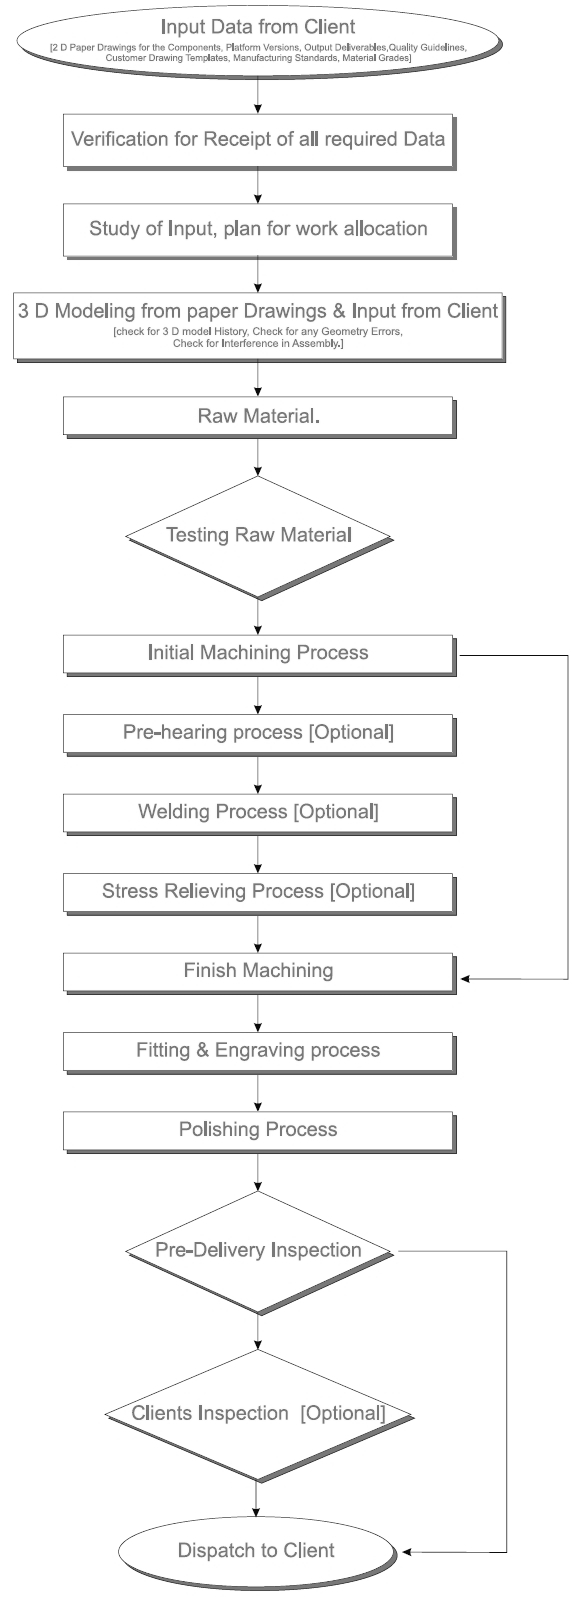 Friends Engineering Industries Pvt Ltd Process Flow Diagram Quality Chart